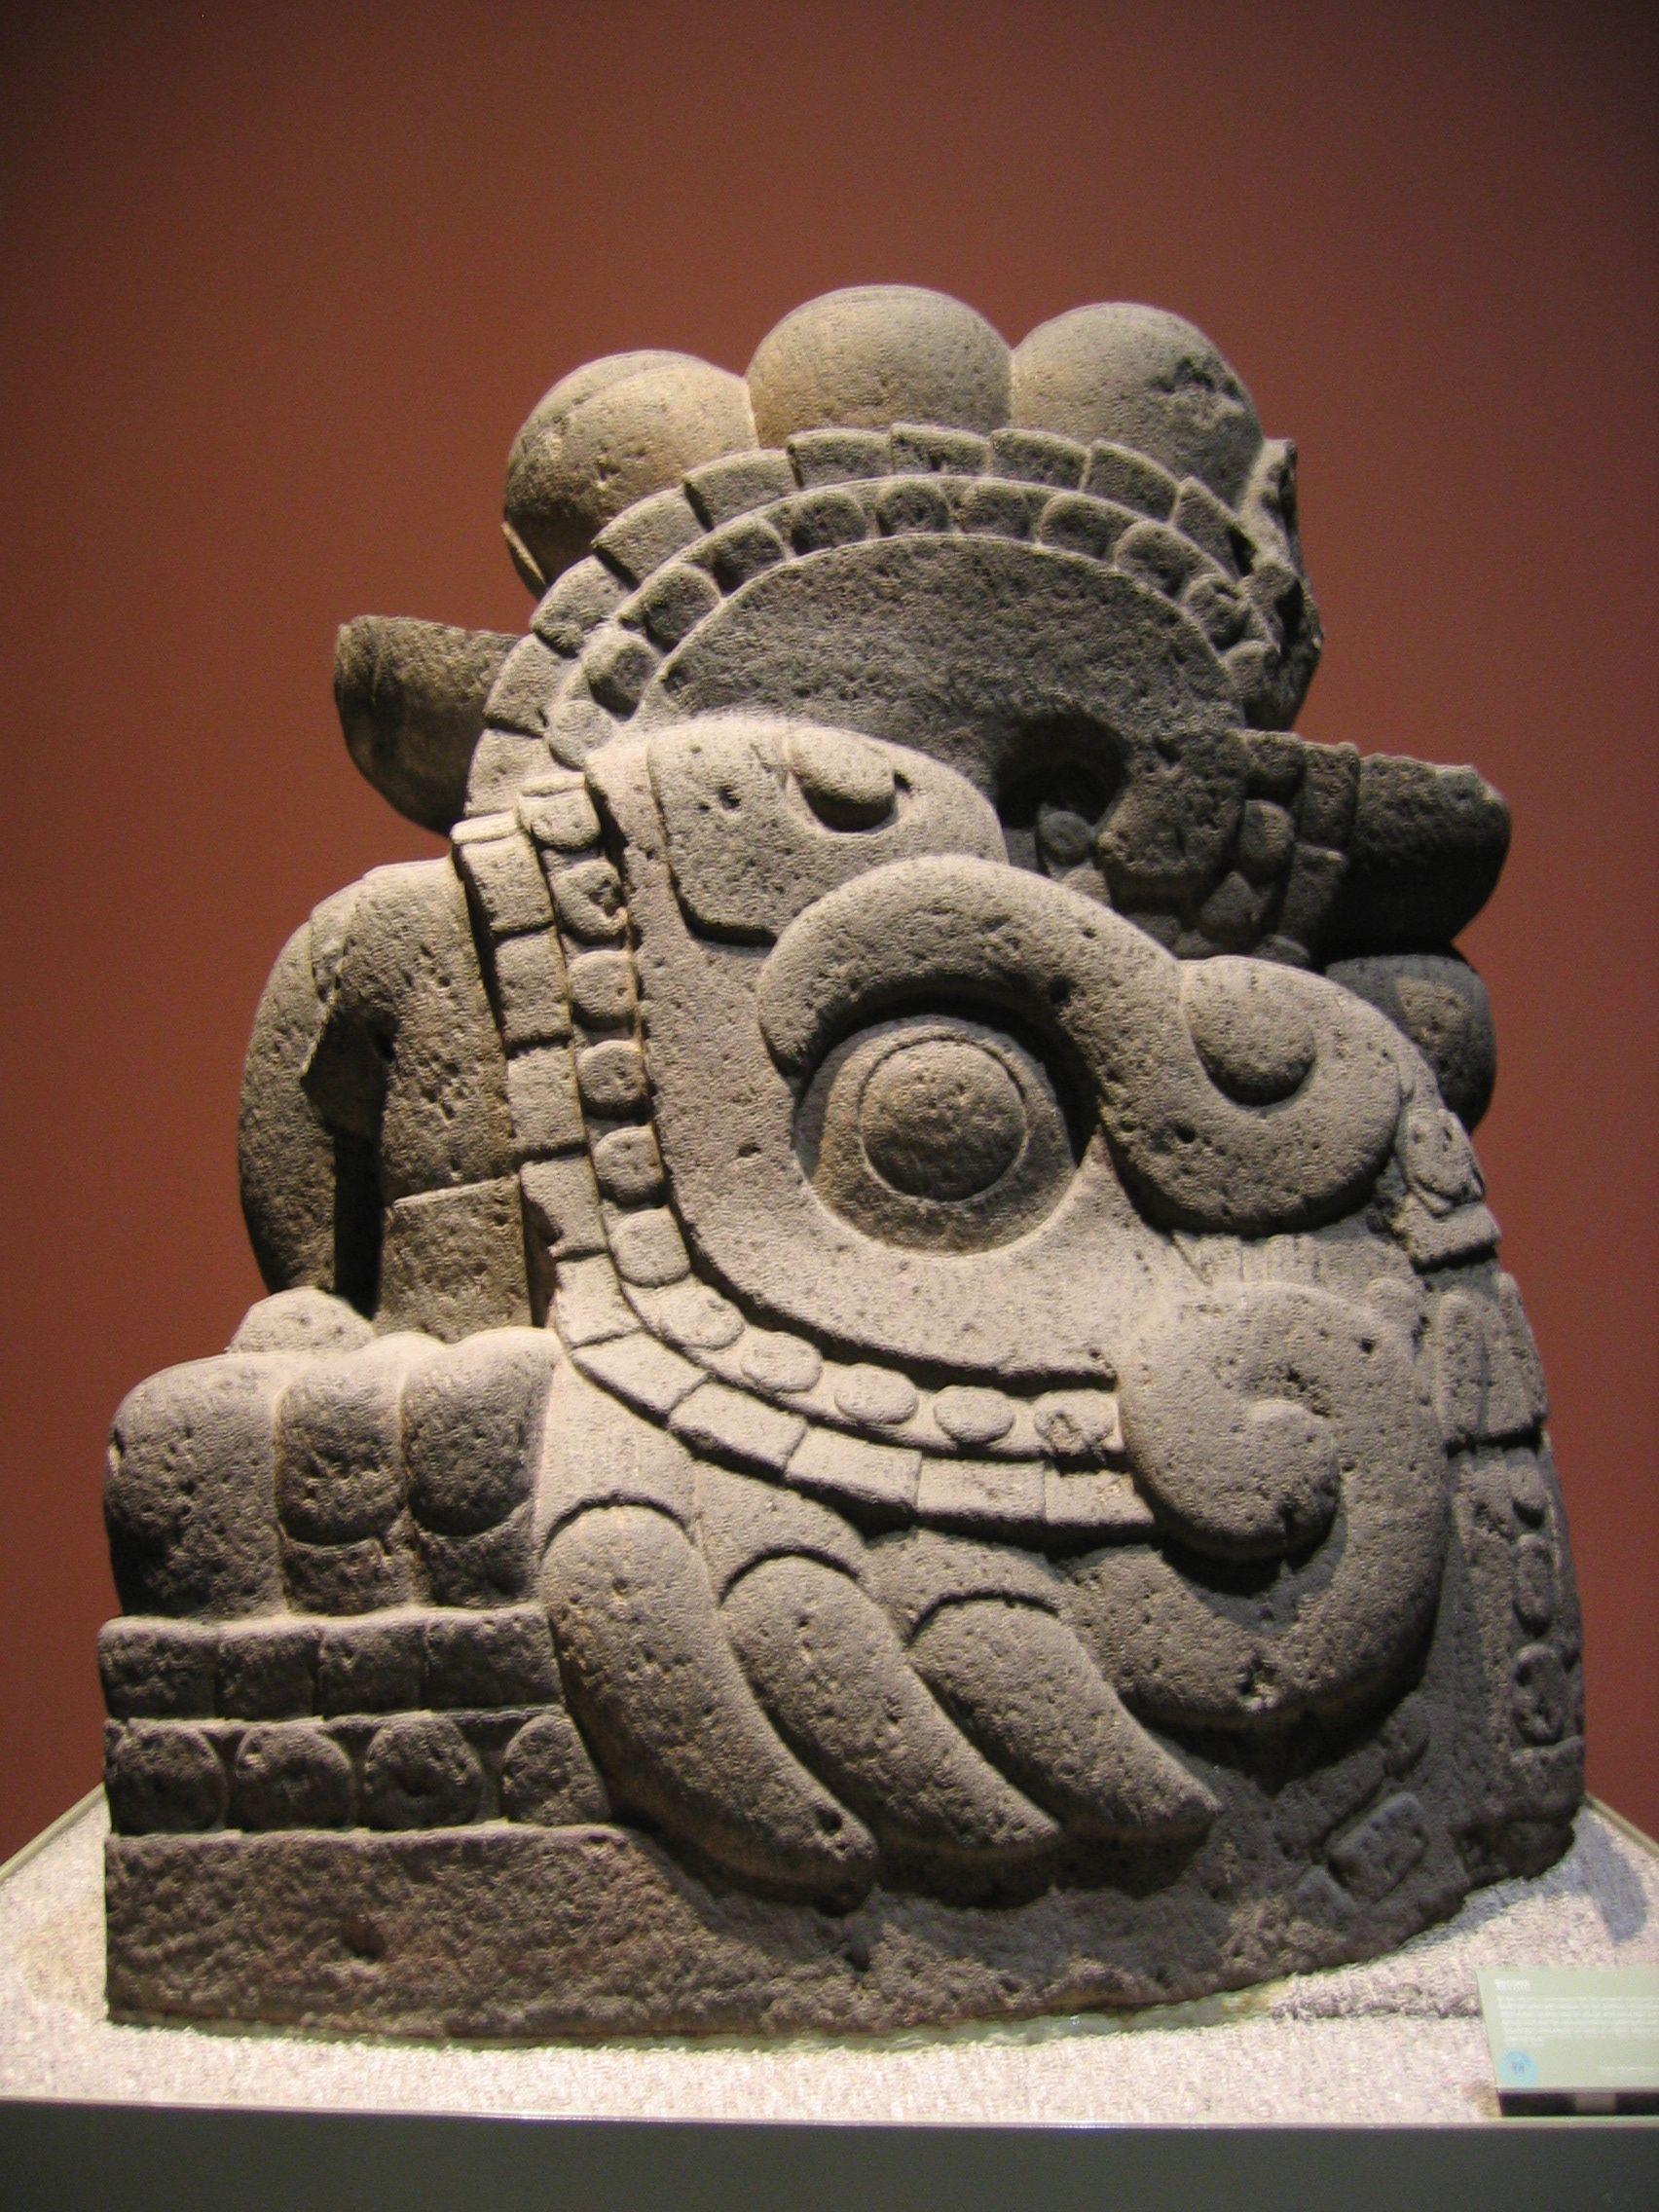 aztec sculptures | mayan | Pinterest | Aztec